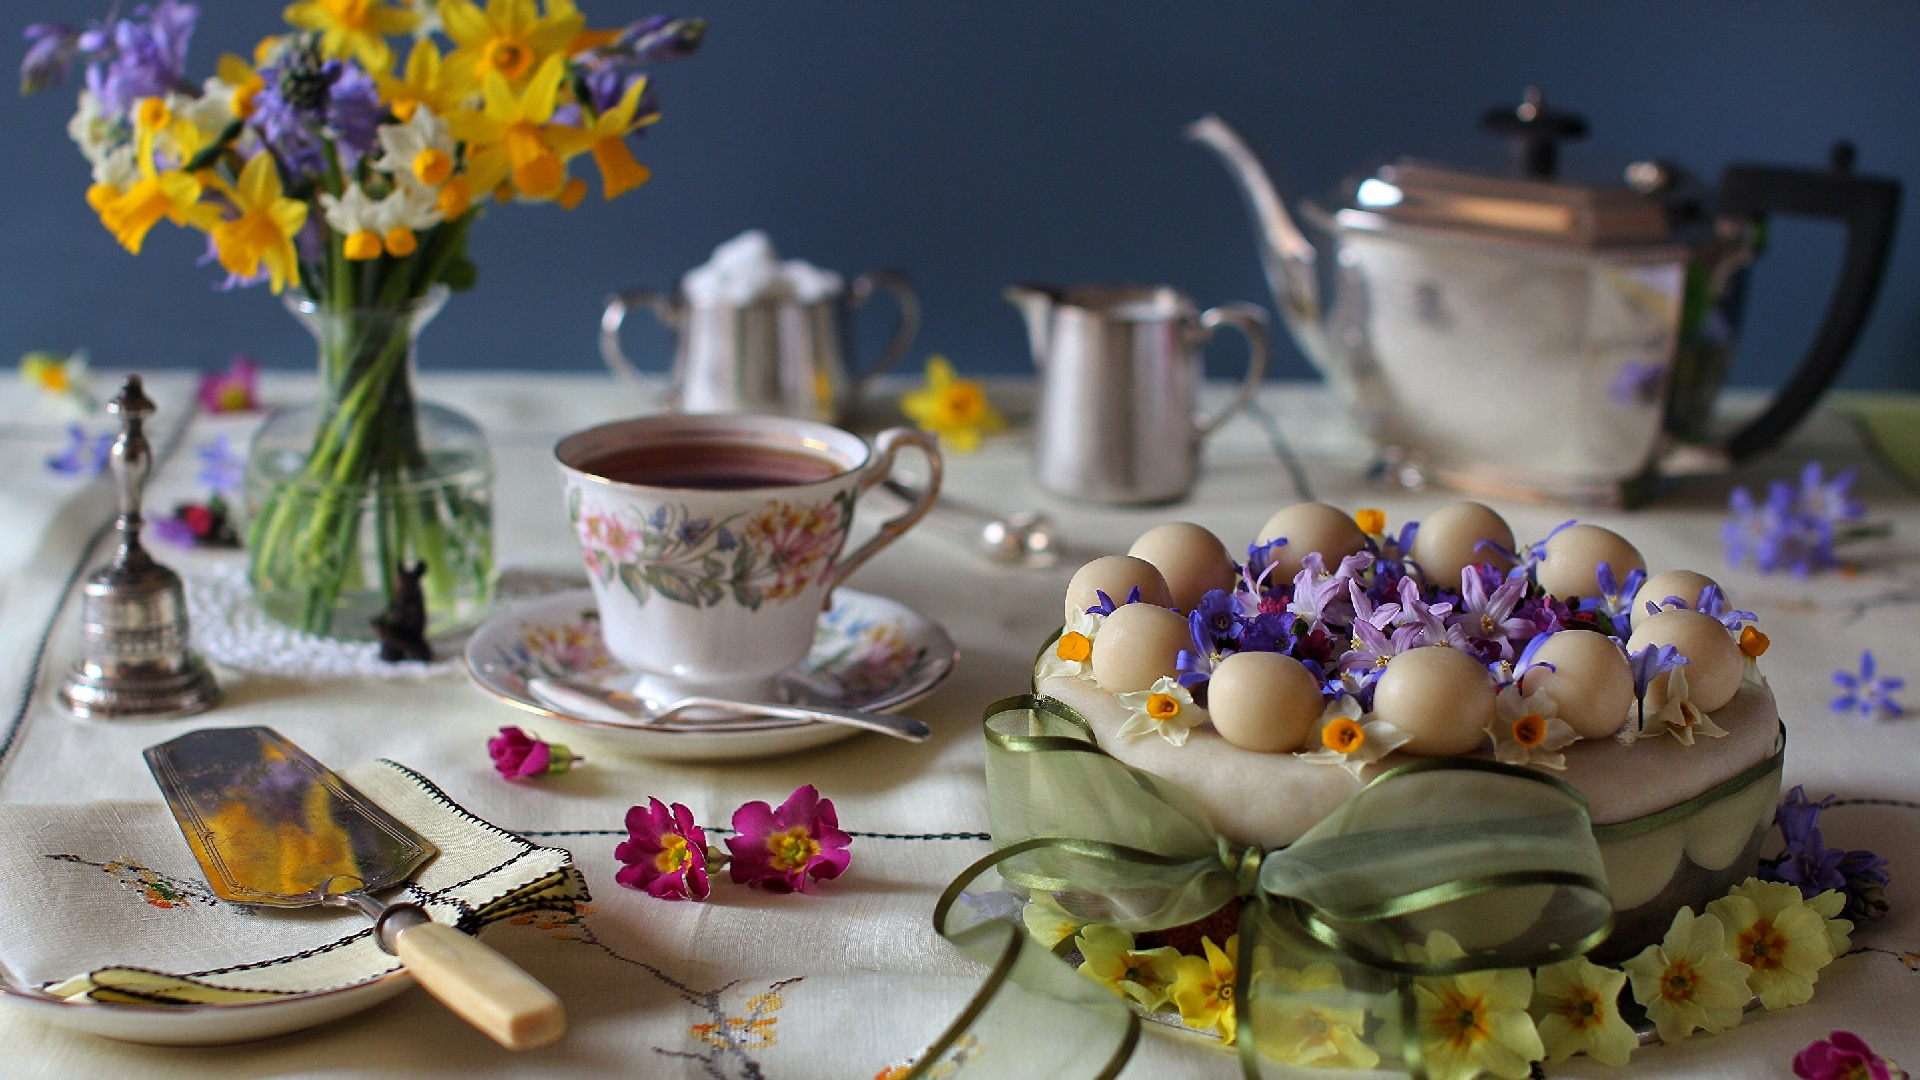 Easter tableware wallpaper